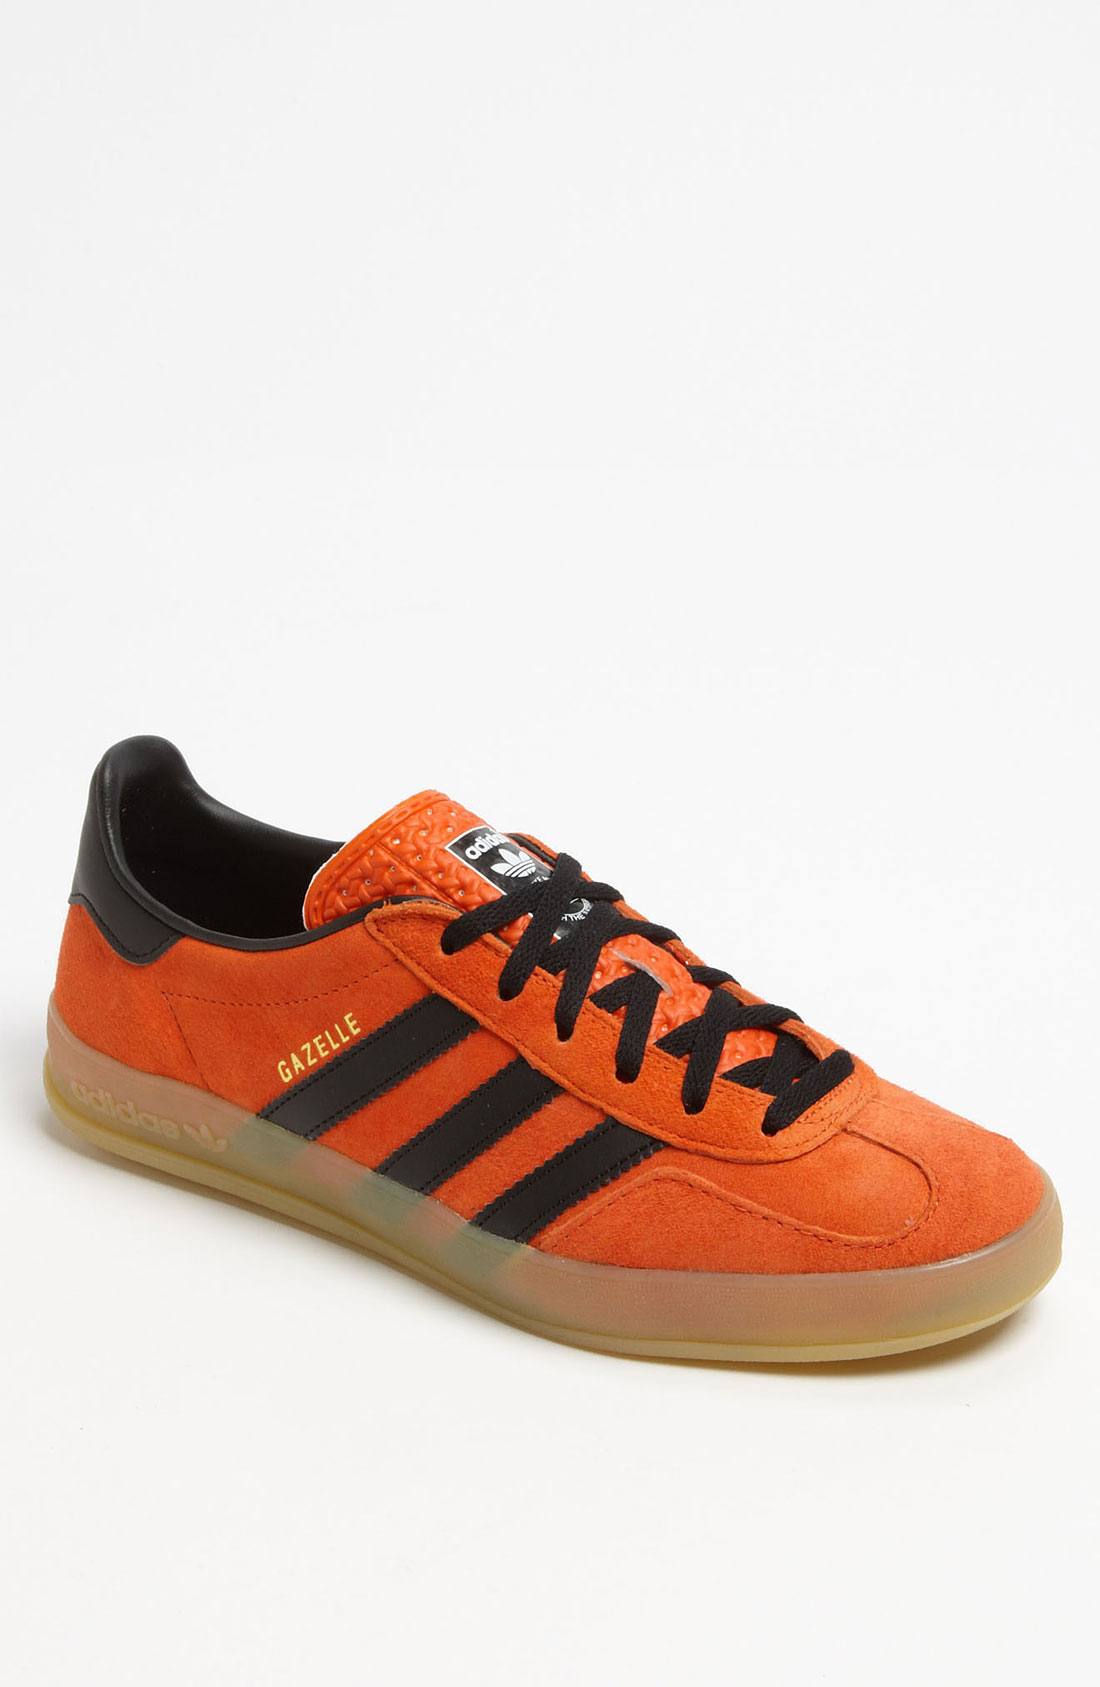 adidas gazelle premium sneaker in orange for men lyst. Black Bedroom Furniture Sets. Home Design Ideas